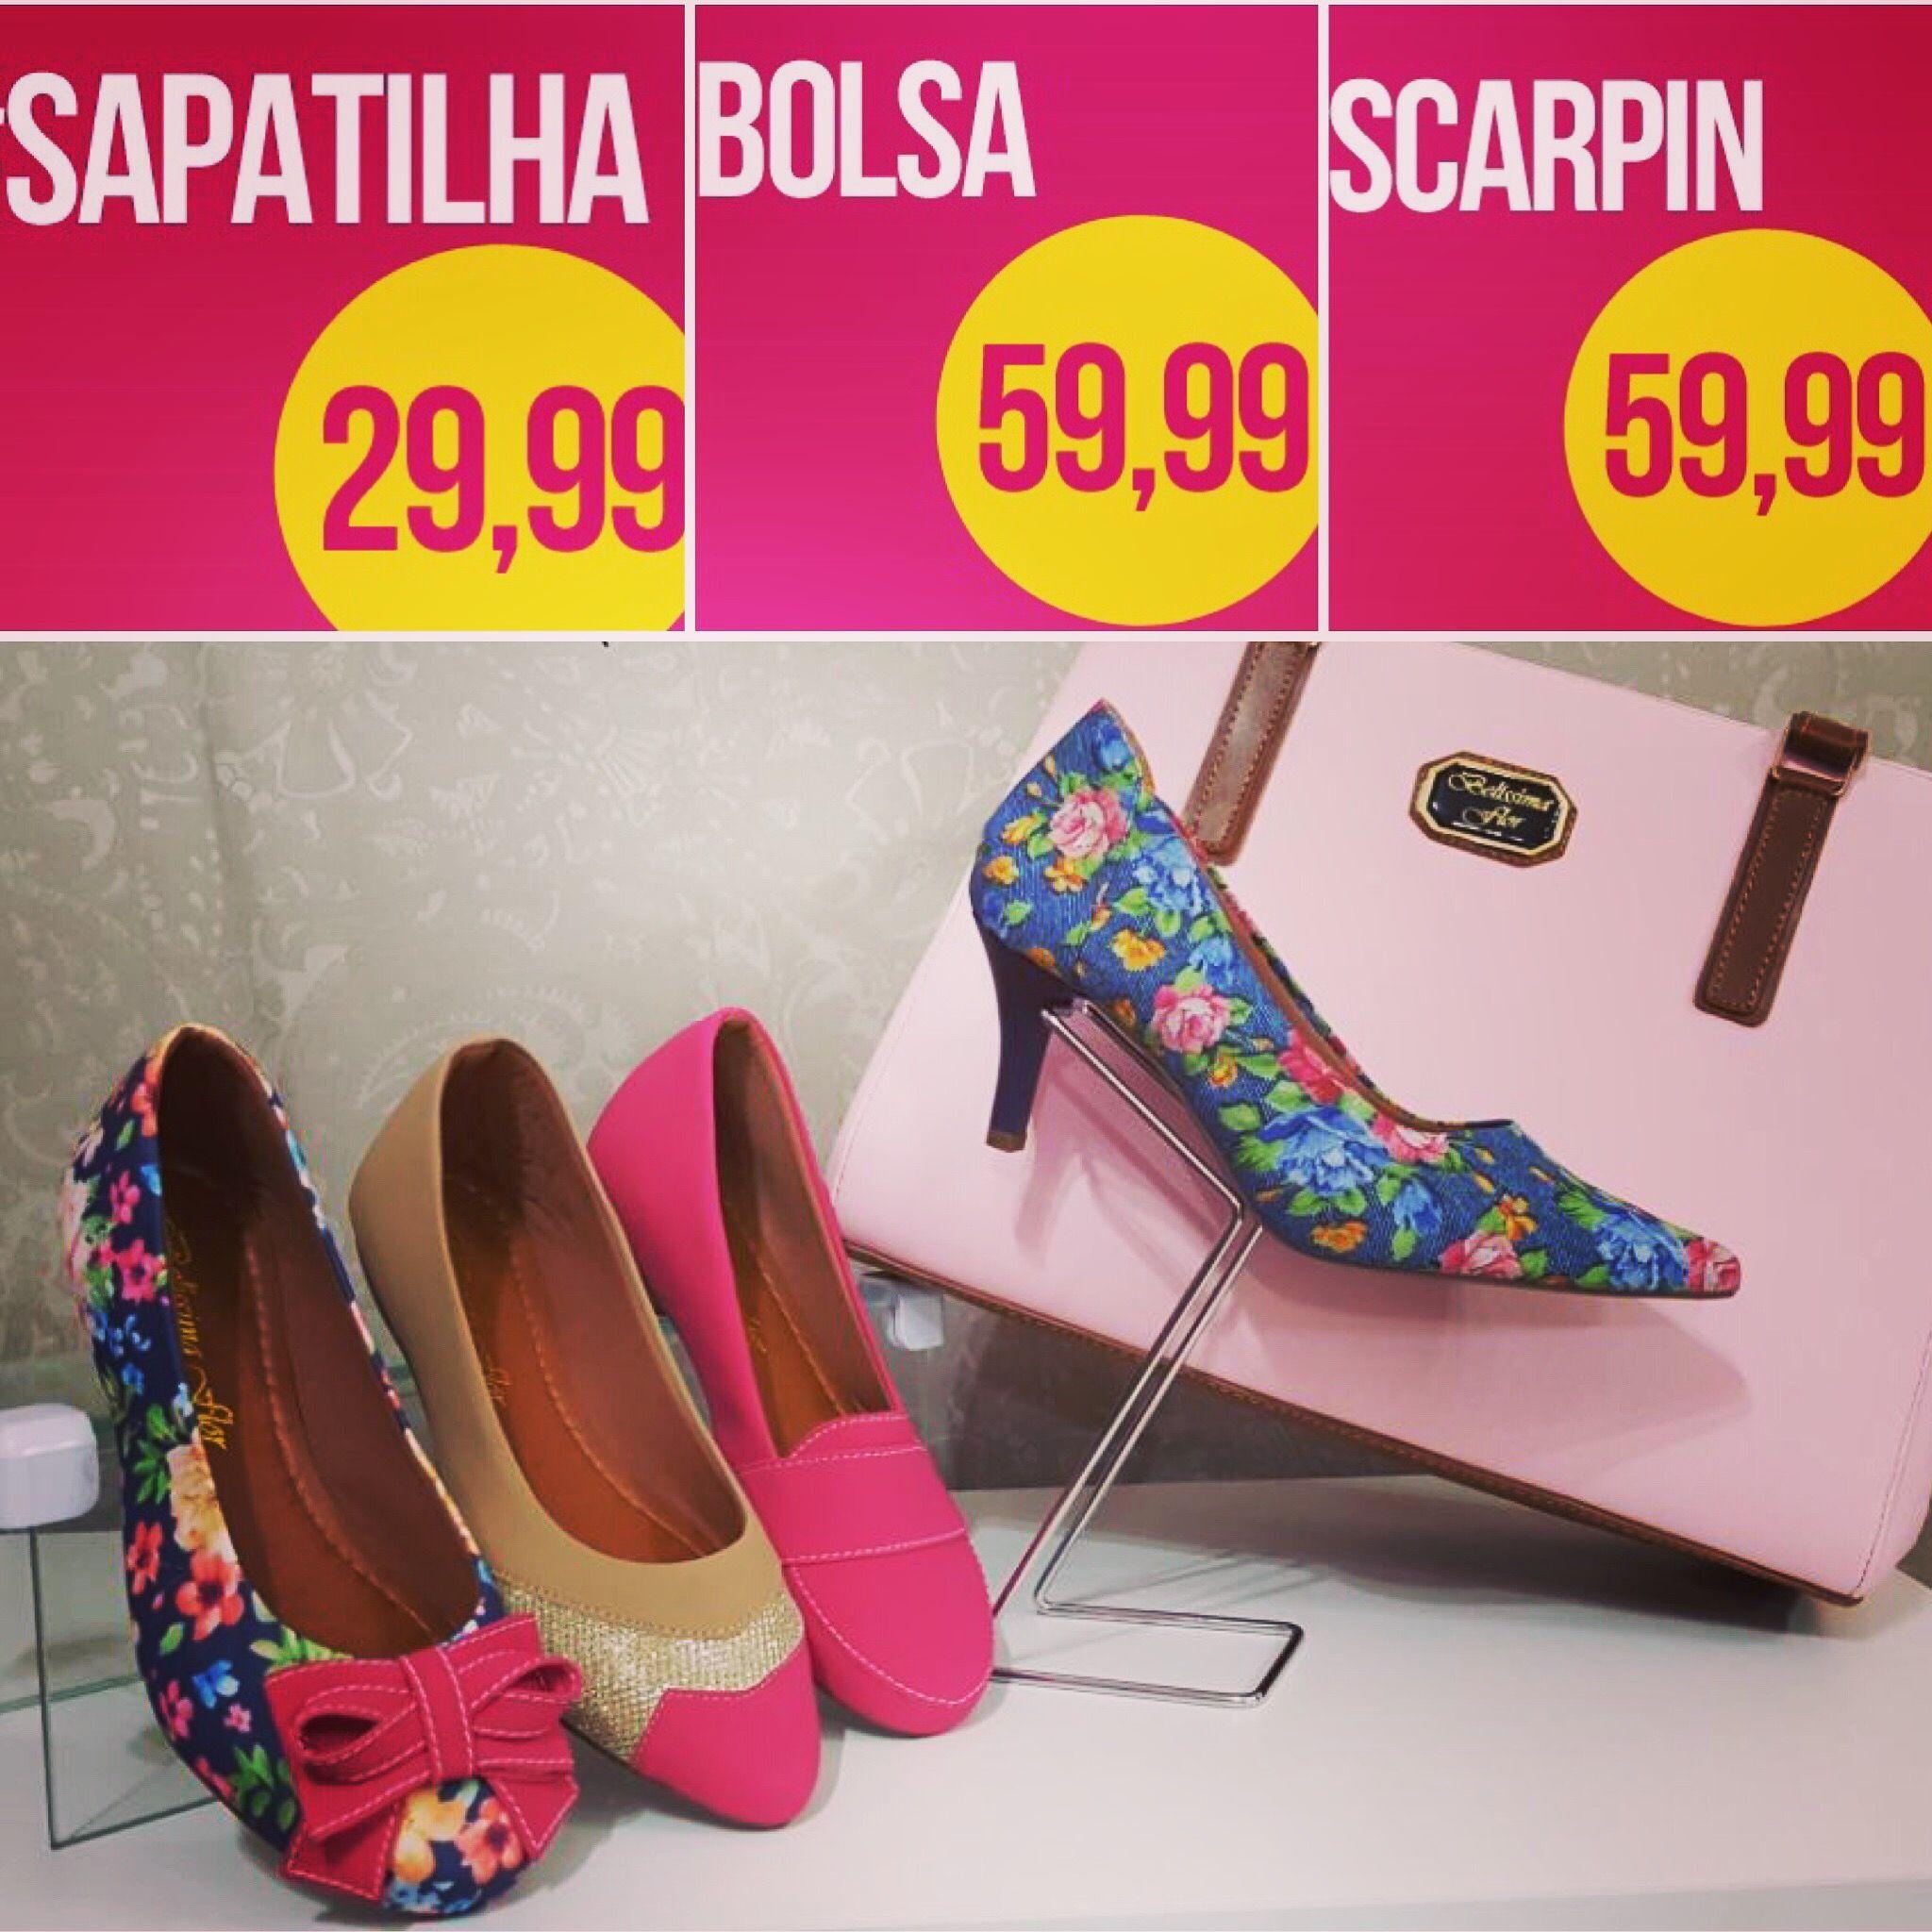 714ffa64a Belíssima Flor Jundiaí: Conforto, moda e preço justo andam juntos! |  Sapatilha